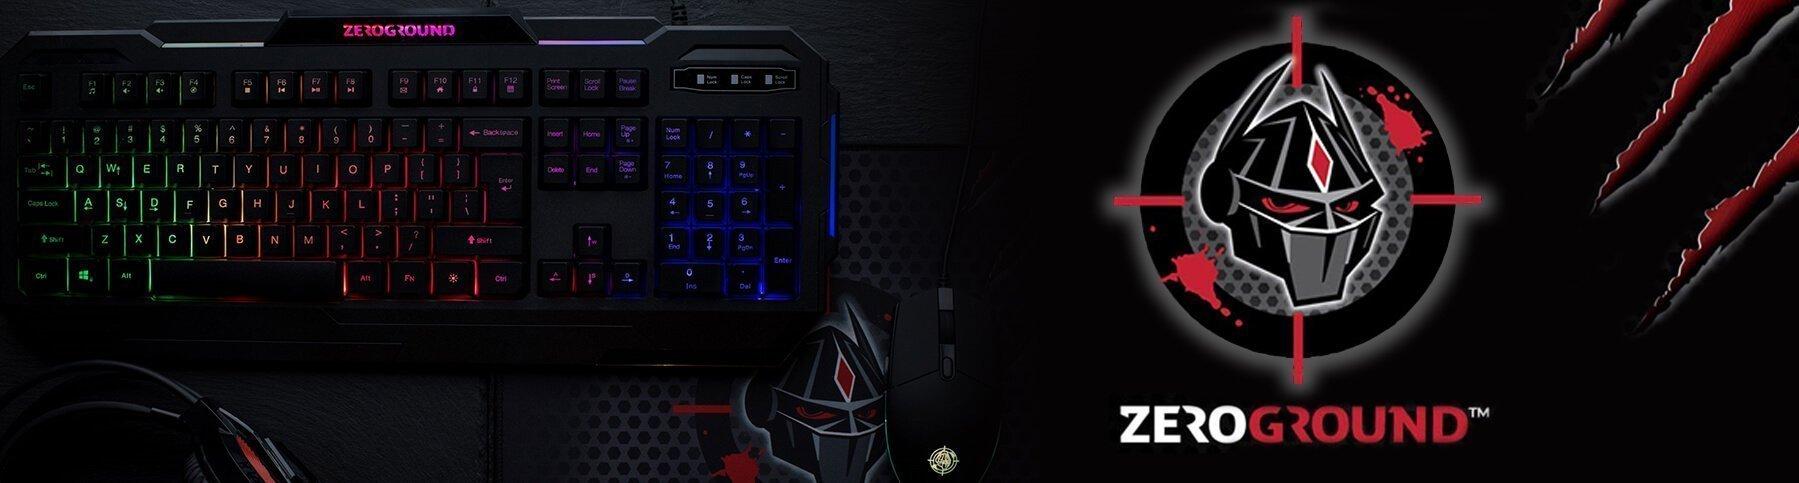 zeroground gaming peripherals, zeroground gaming περιφερειακά